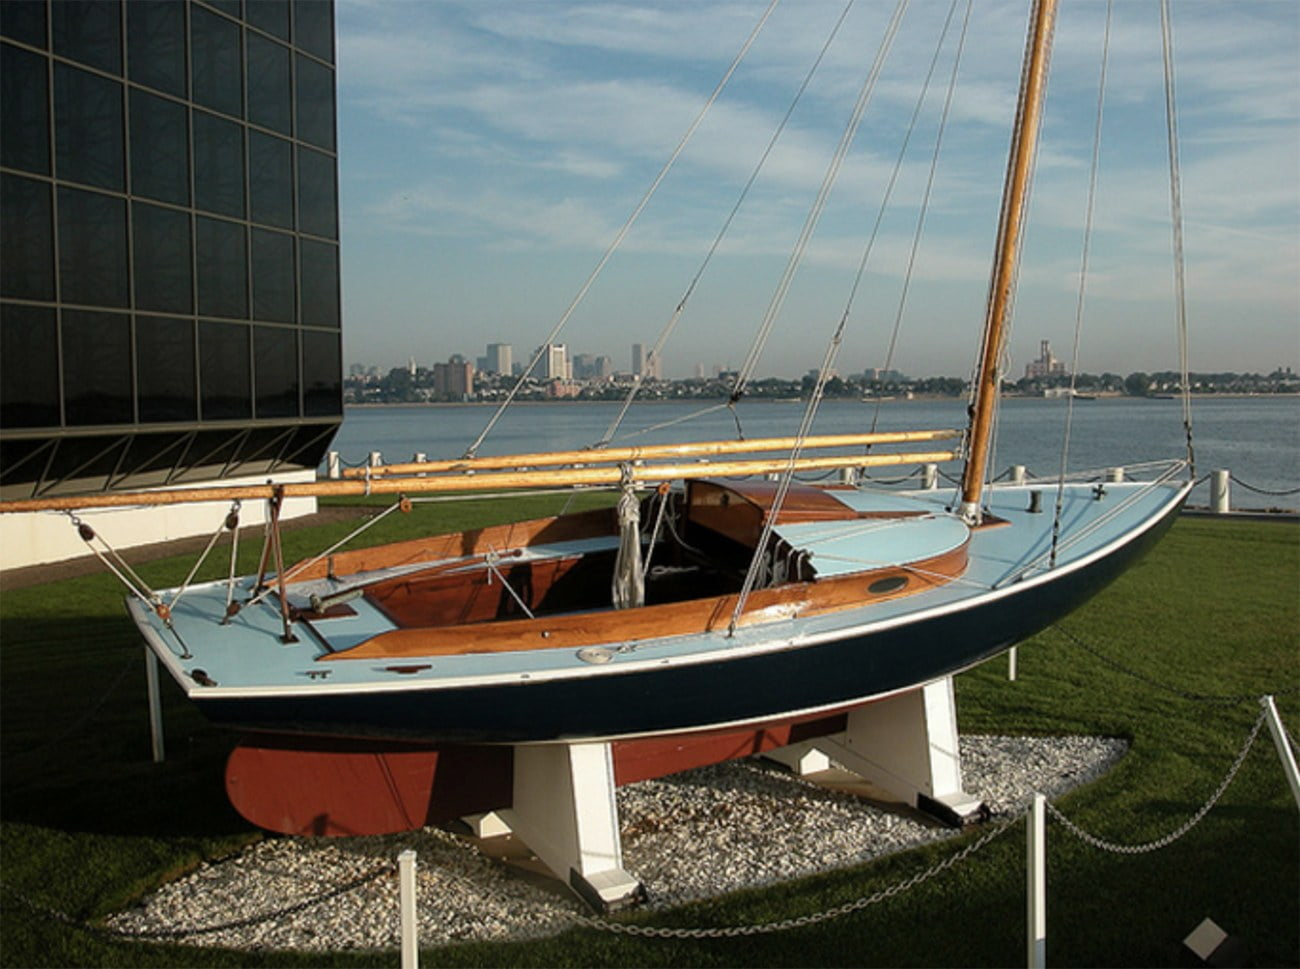 Imagem do veleiro